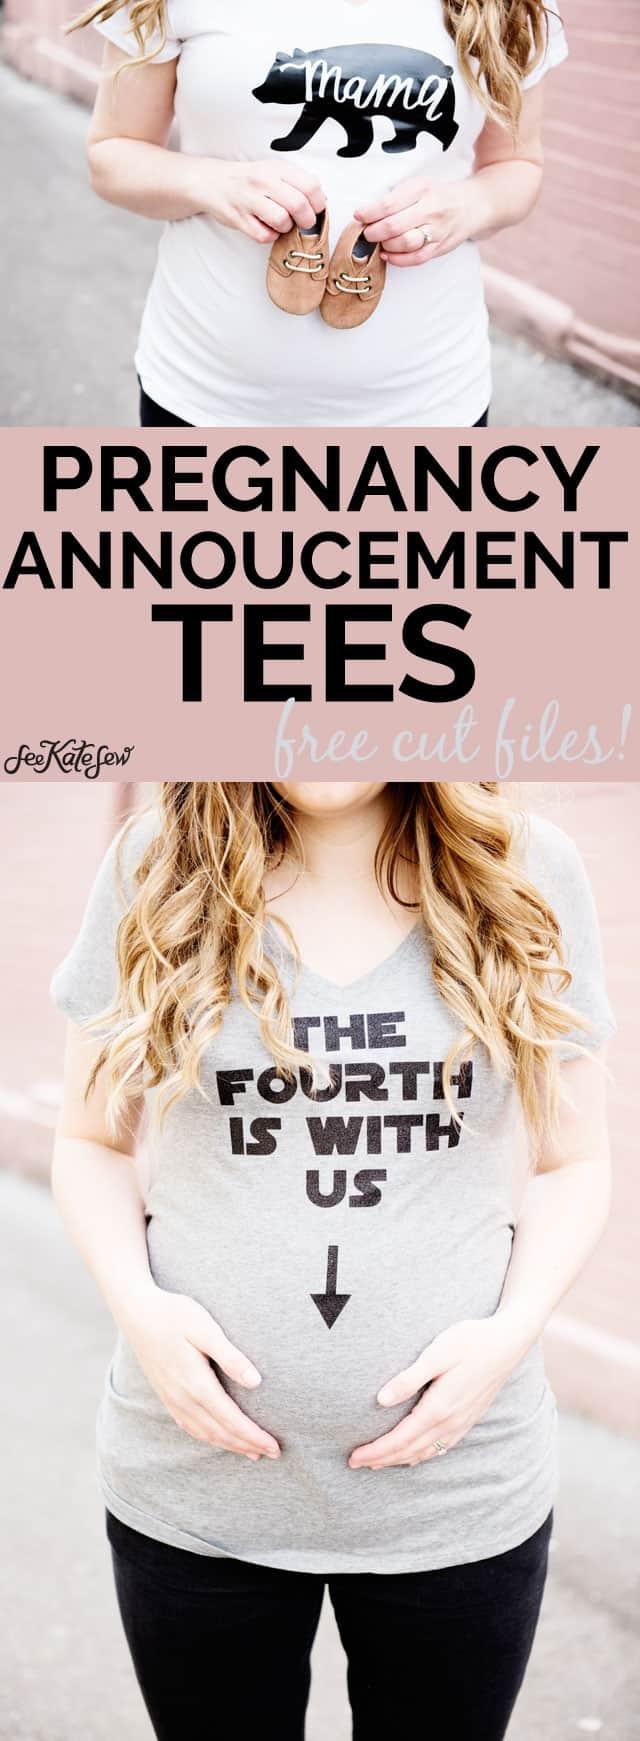 DIY Pregnancy Annoucement Tees   pregnancy announcement t-shirts   pregnancy announcement ideas   diy pregnancy announcement    See Kate Sew #pregnancyannouncement #diytshirt